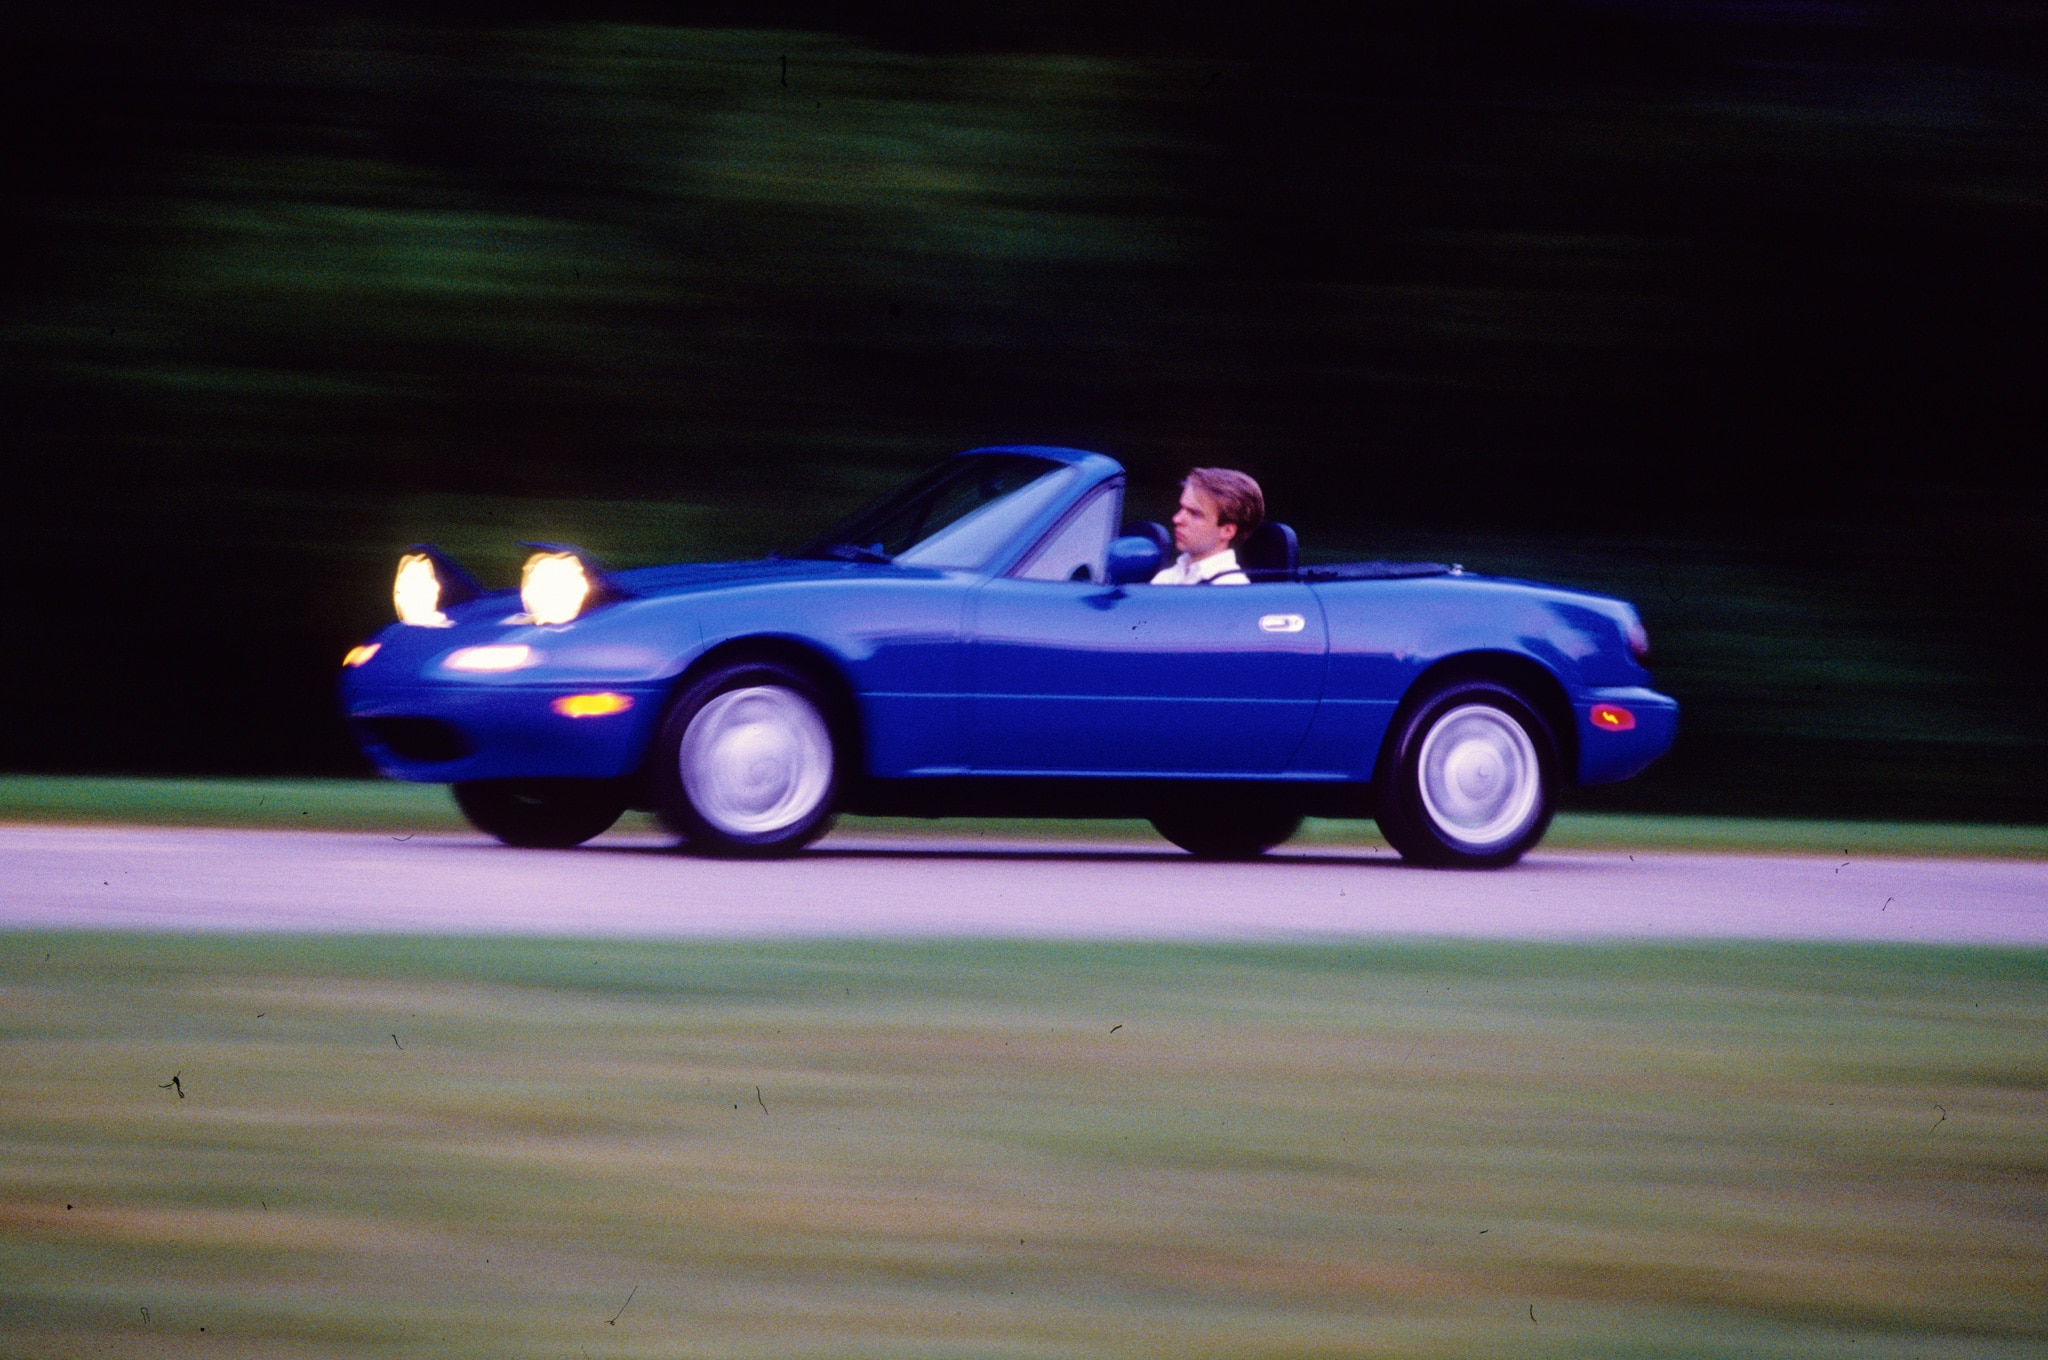 1990 Mazda MX-5 Miata Review